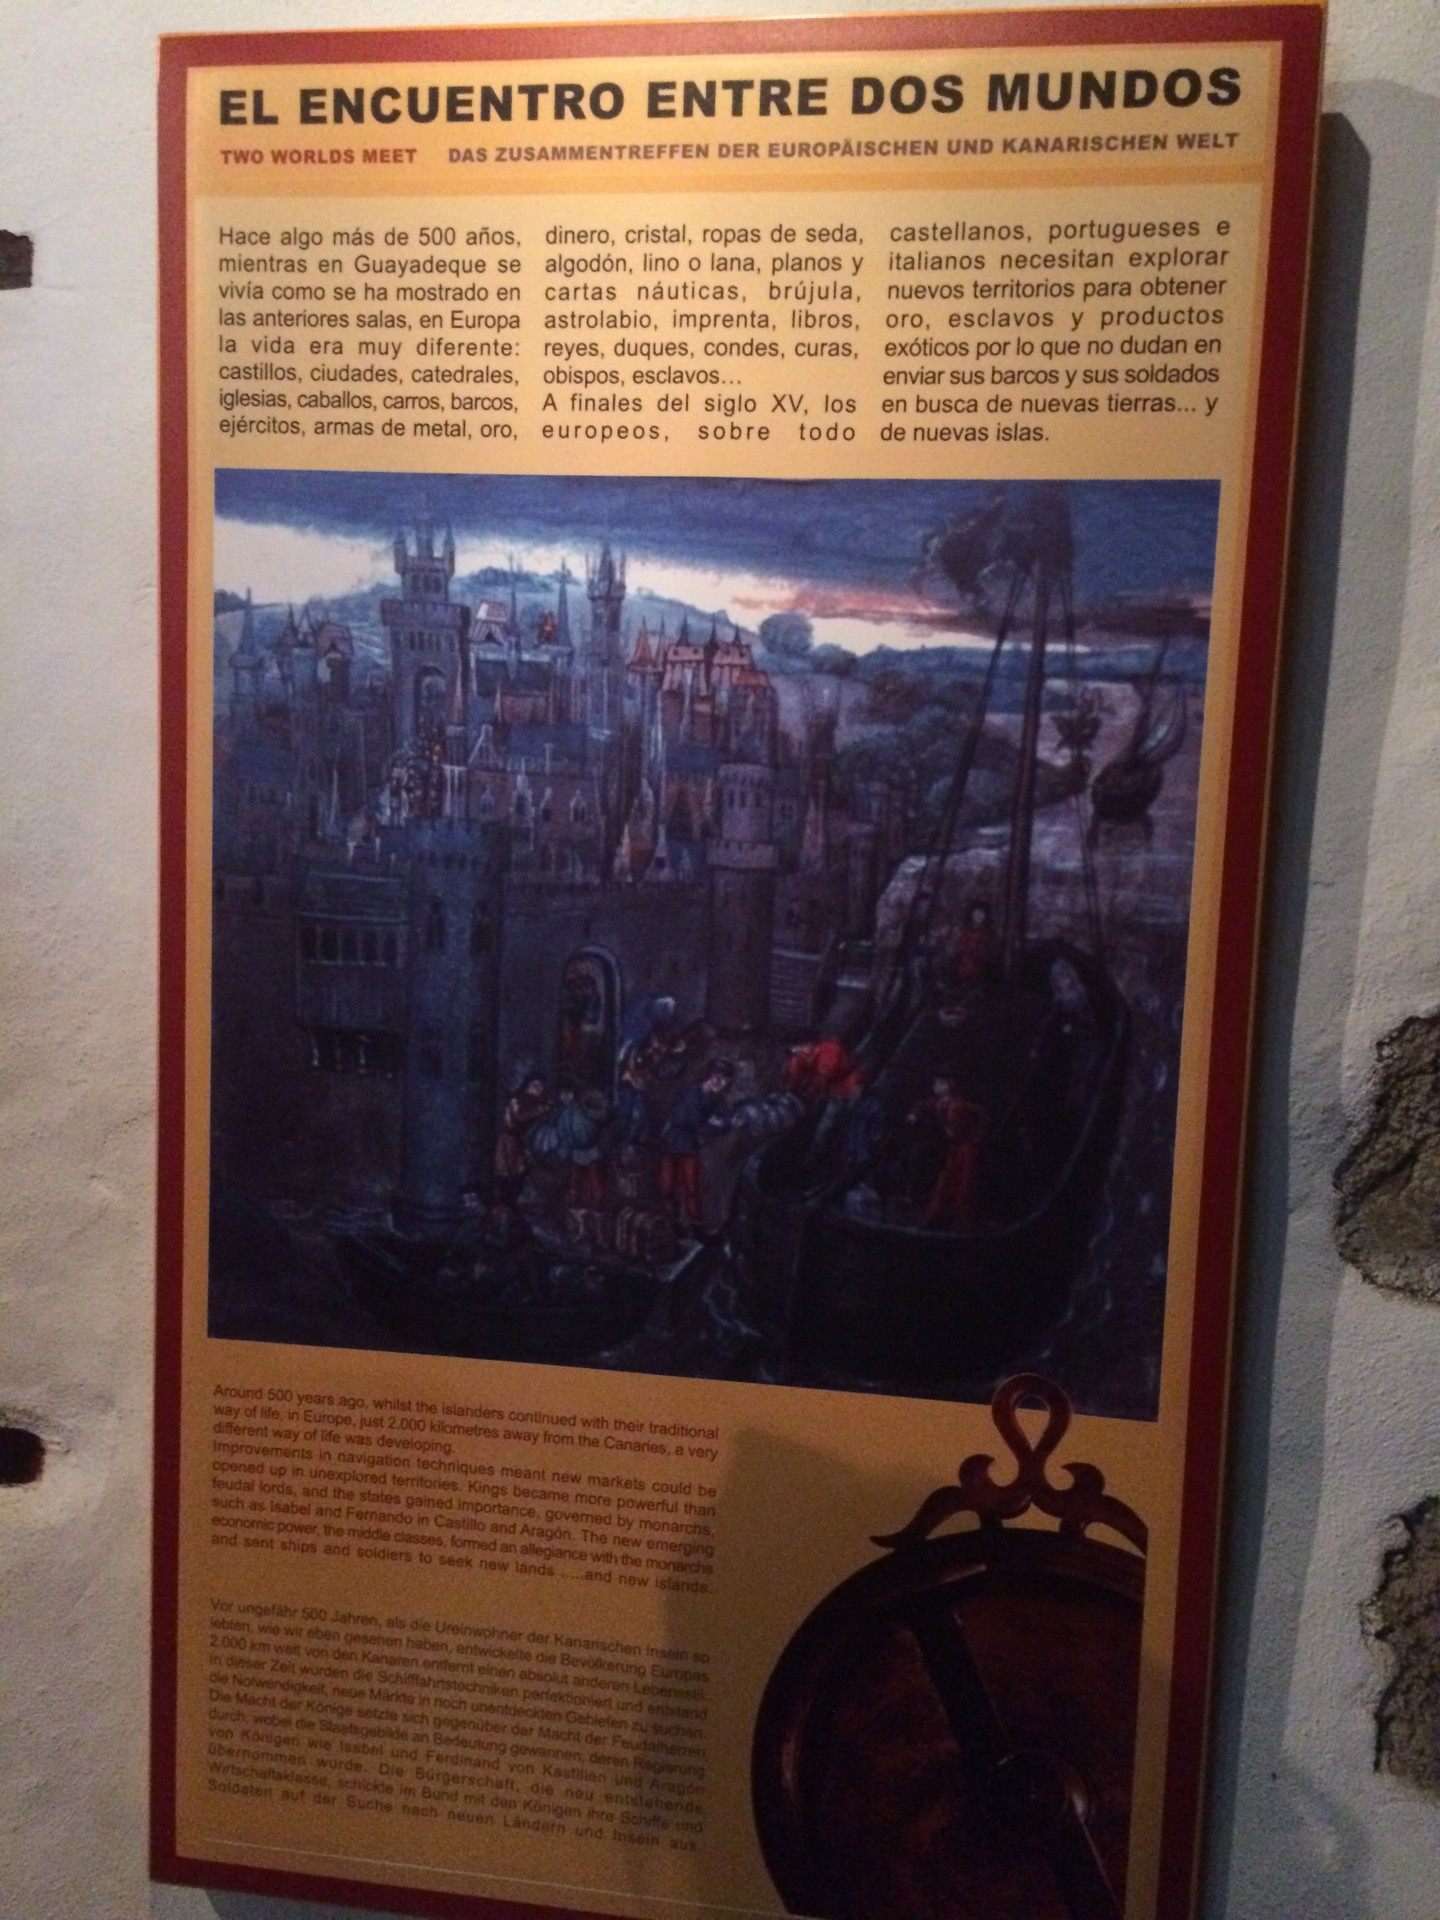 museo-guayadeque-30bd05903d1376a35367c14